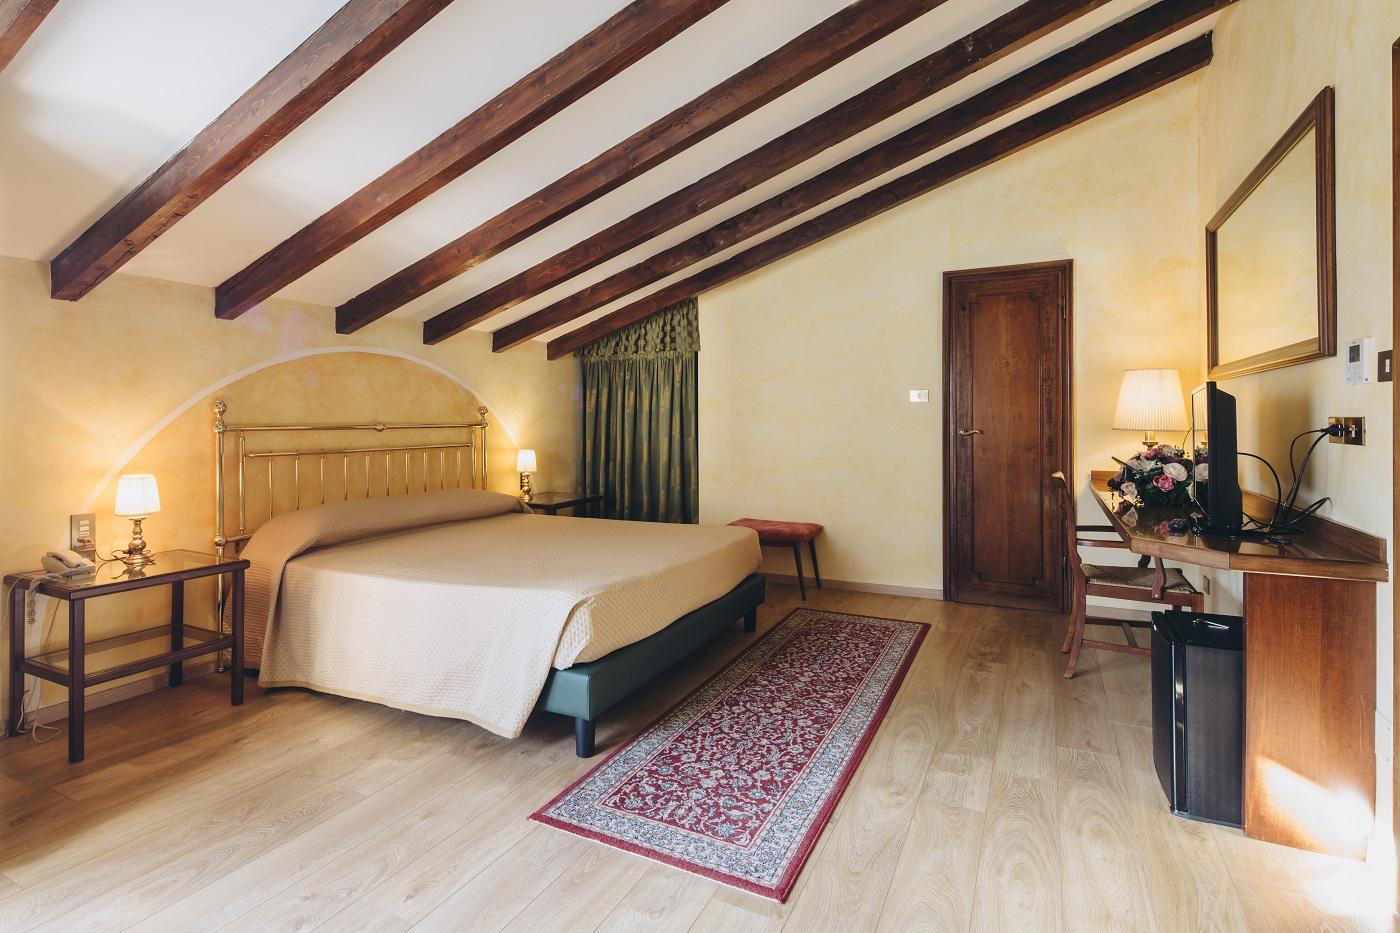 suite-mansardata-hotel-roma-bologna